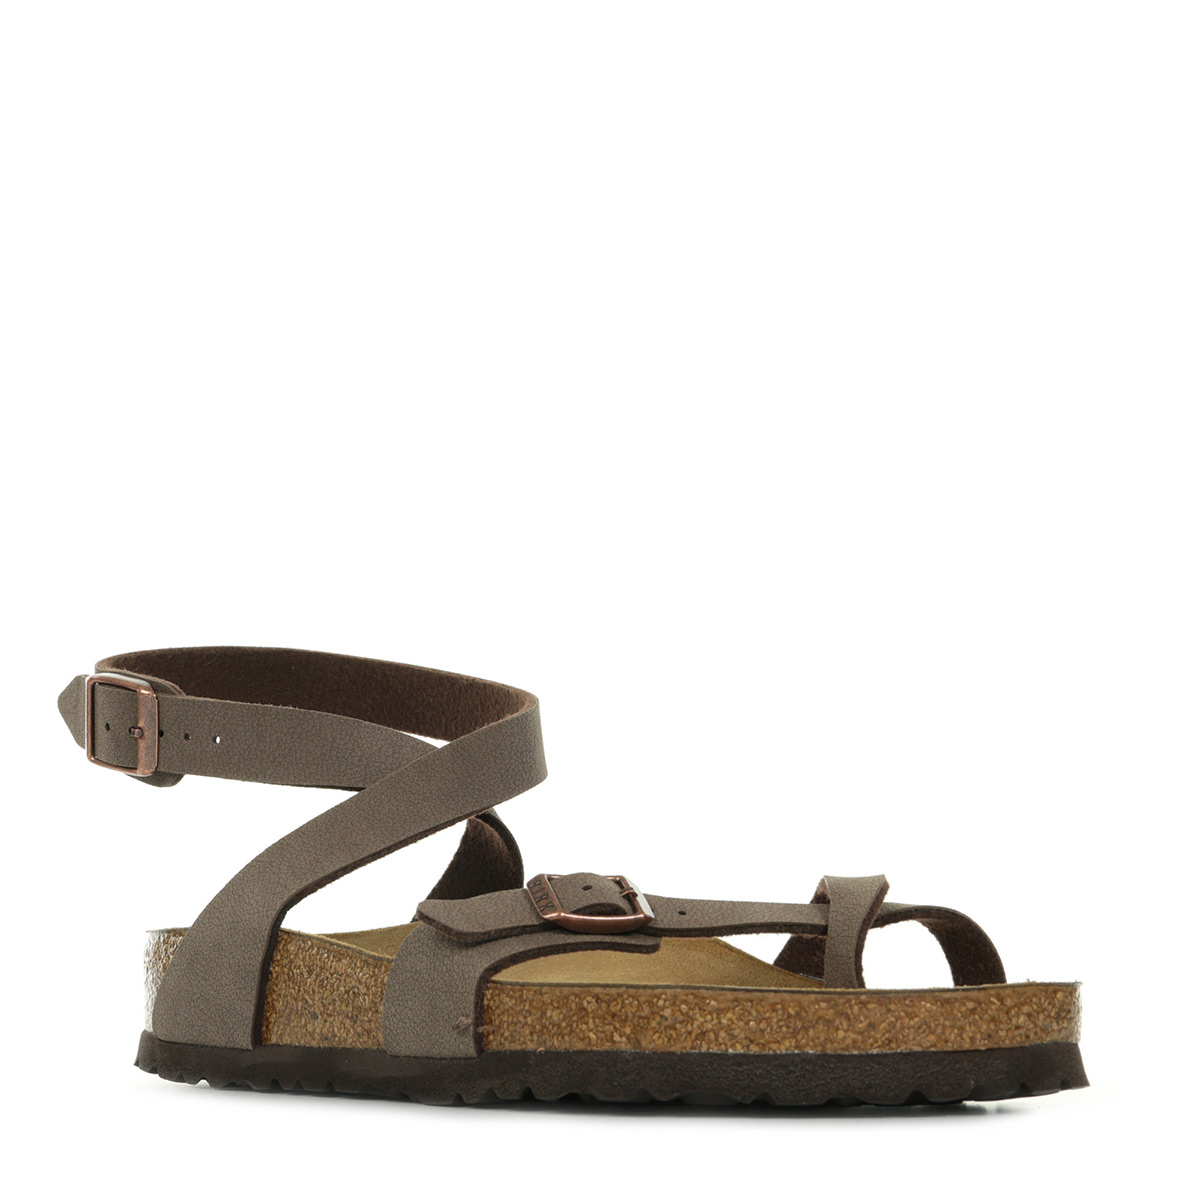 ... Birkenstock Yara · Birkenstock Yara · Birkenstock Yara · Accueil ·  Chaussures · Chaussures Femme · Sandales  Birkenstock Yara